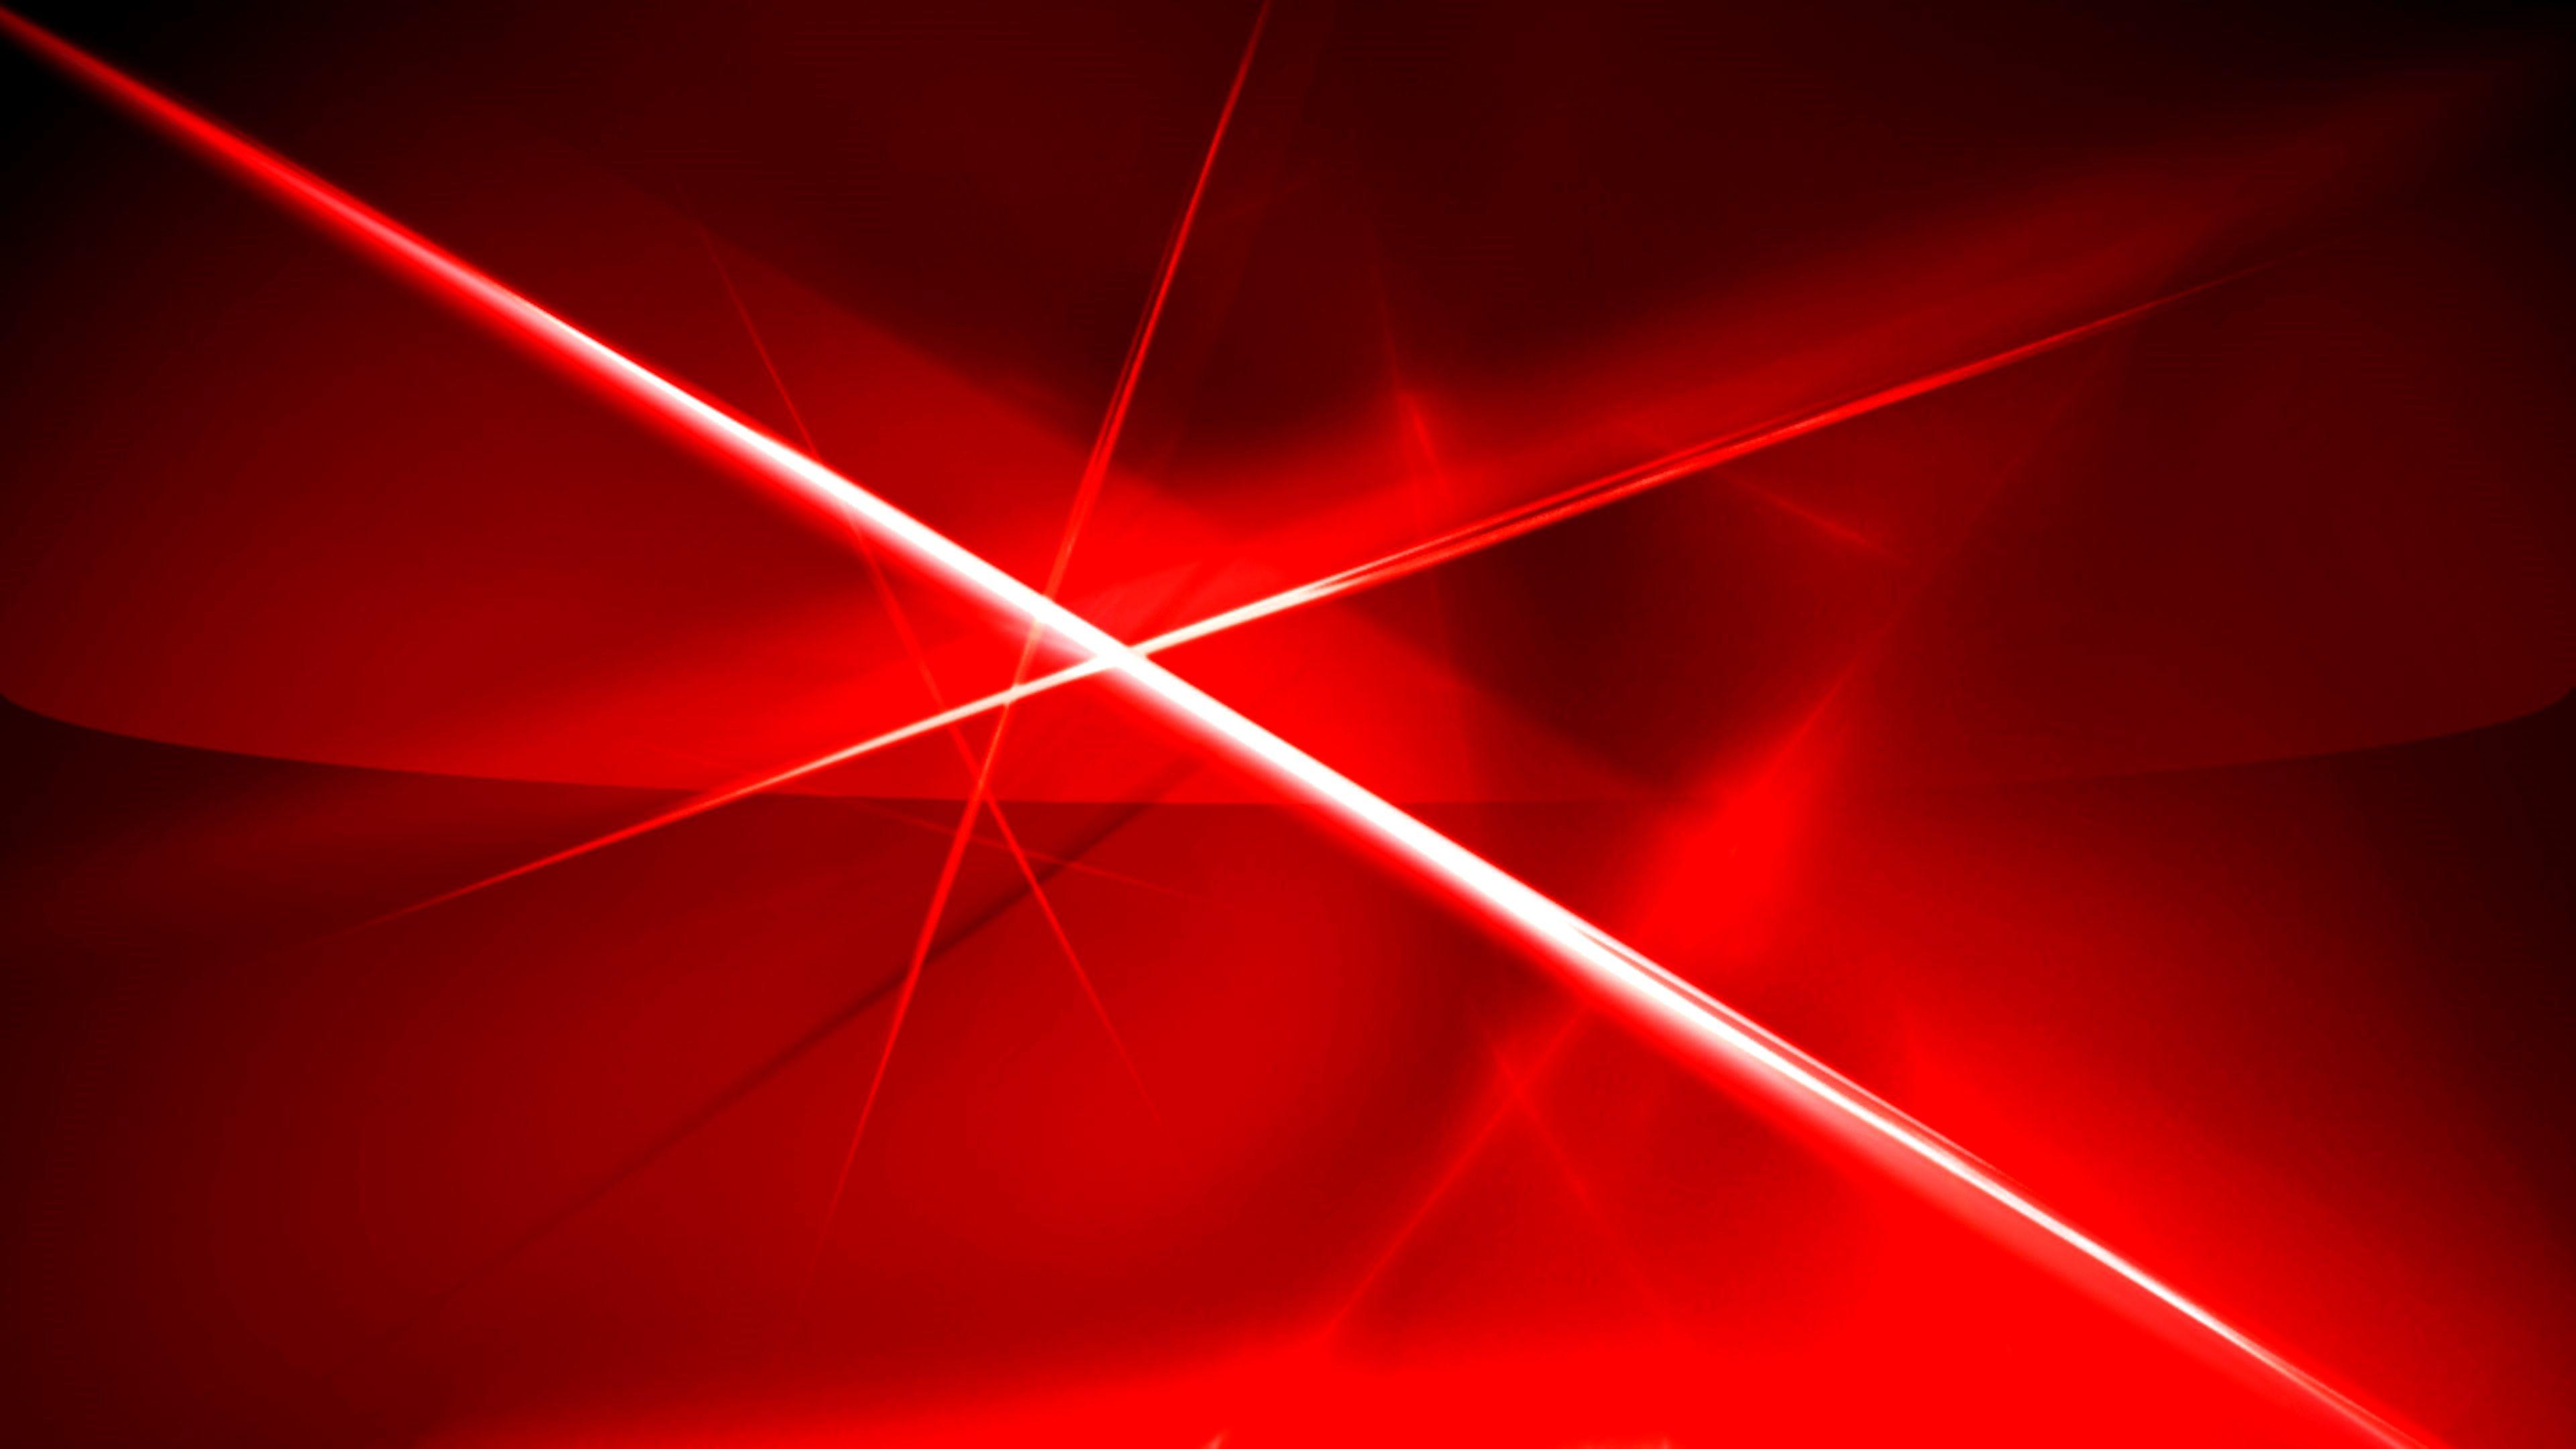 4k Wallpaper Abstract Red Trick Seni